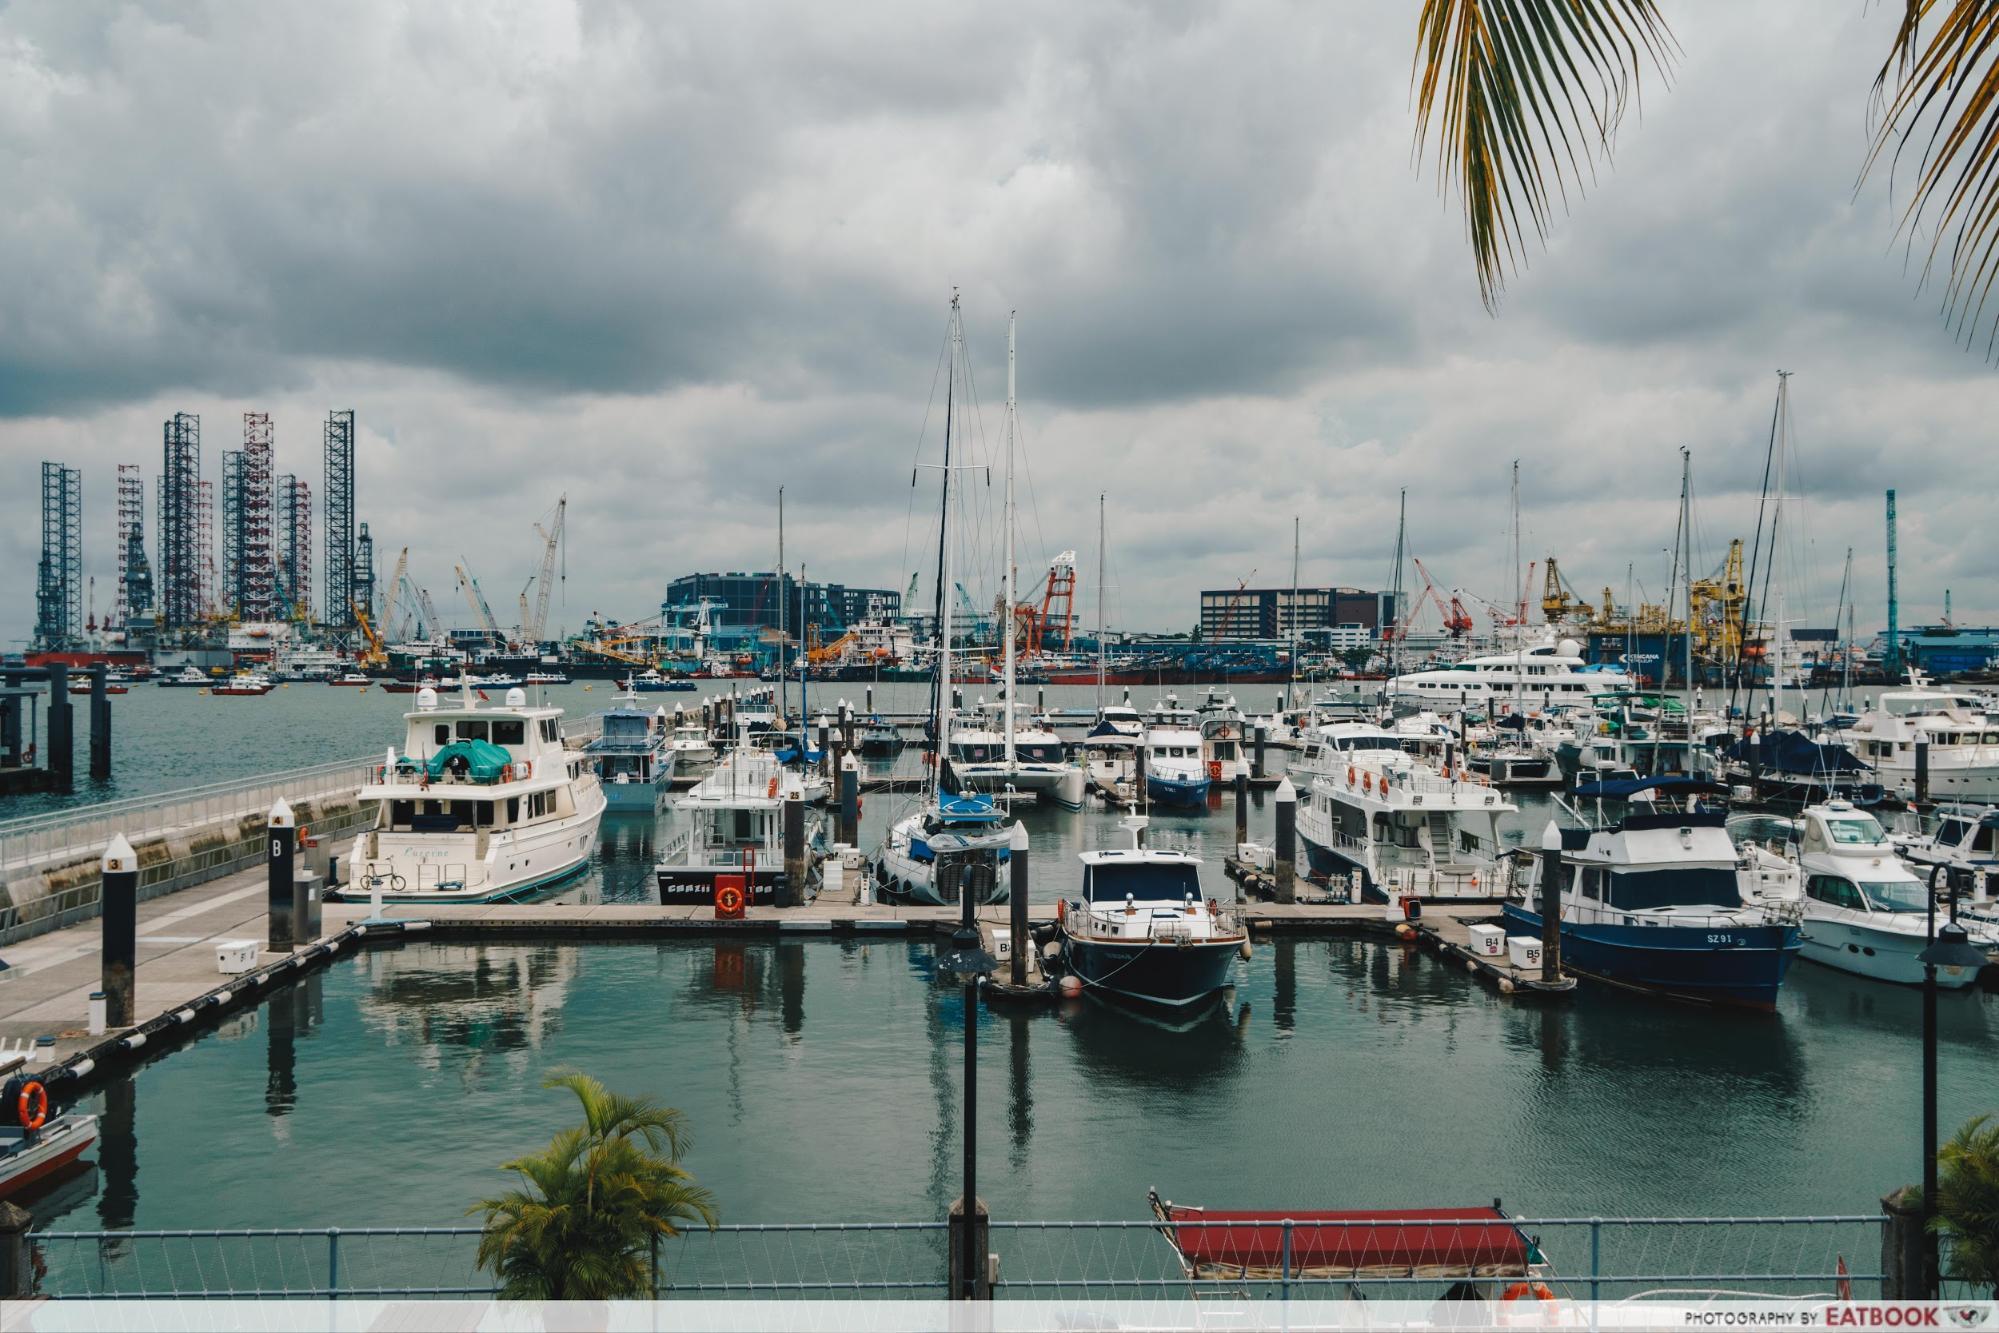 La Pizzeria - Waterfront at Singapore Yatch Club